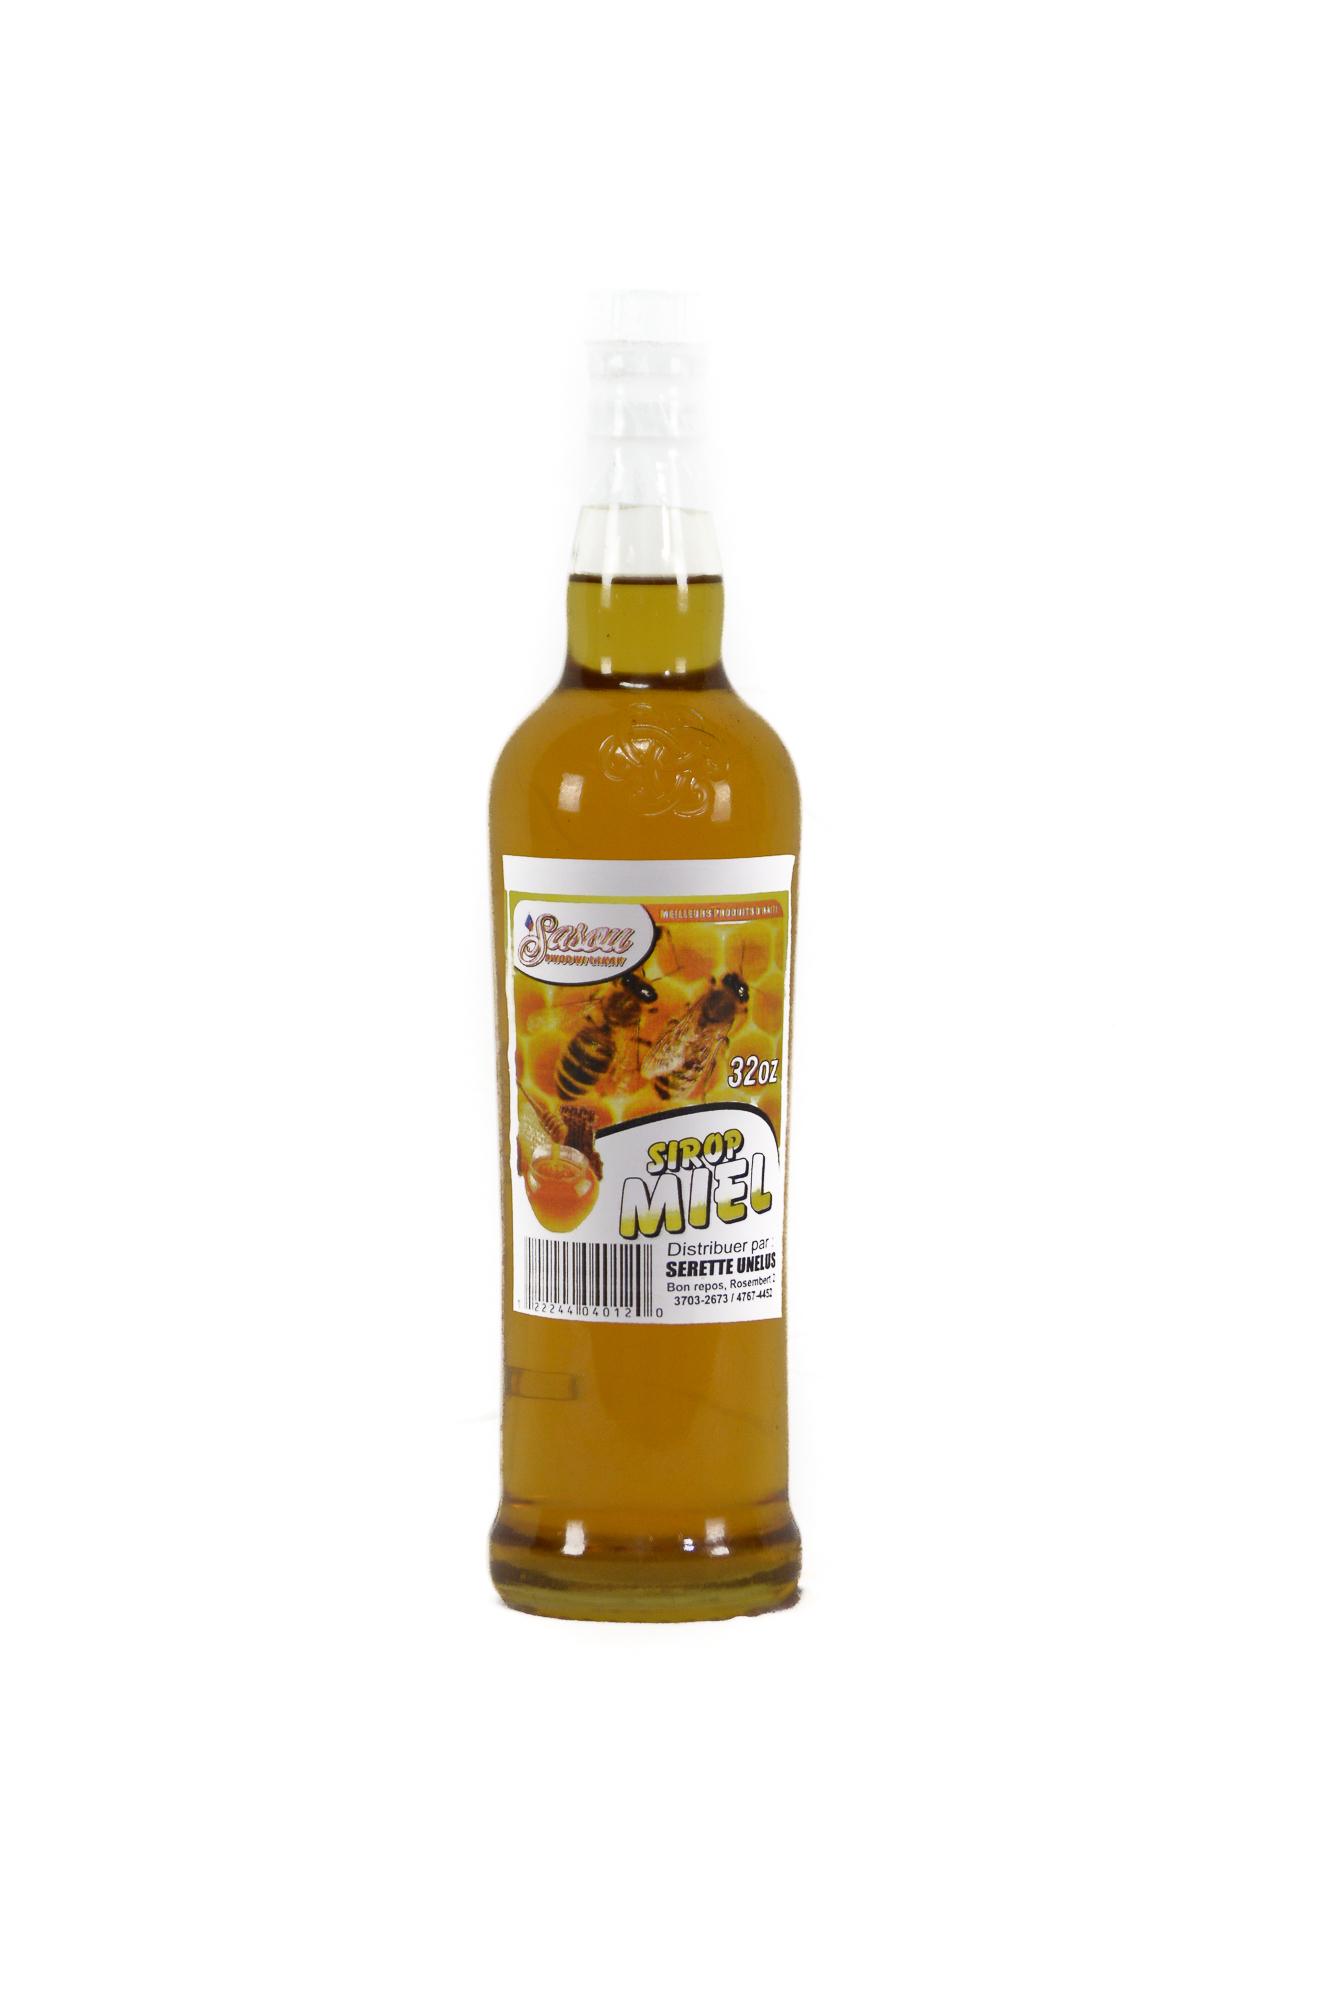 Honey /Sirop Miel local 32 Oz